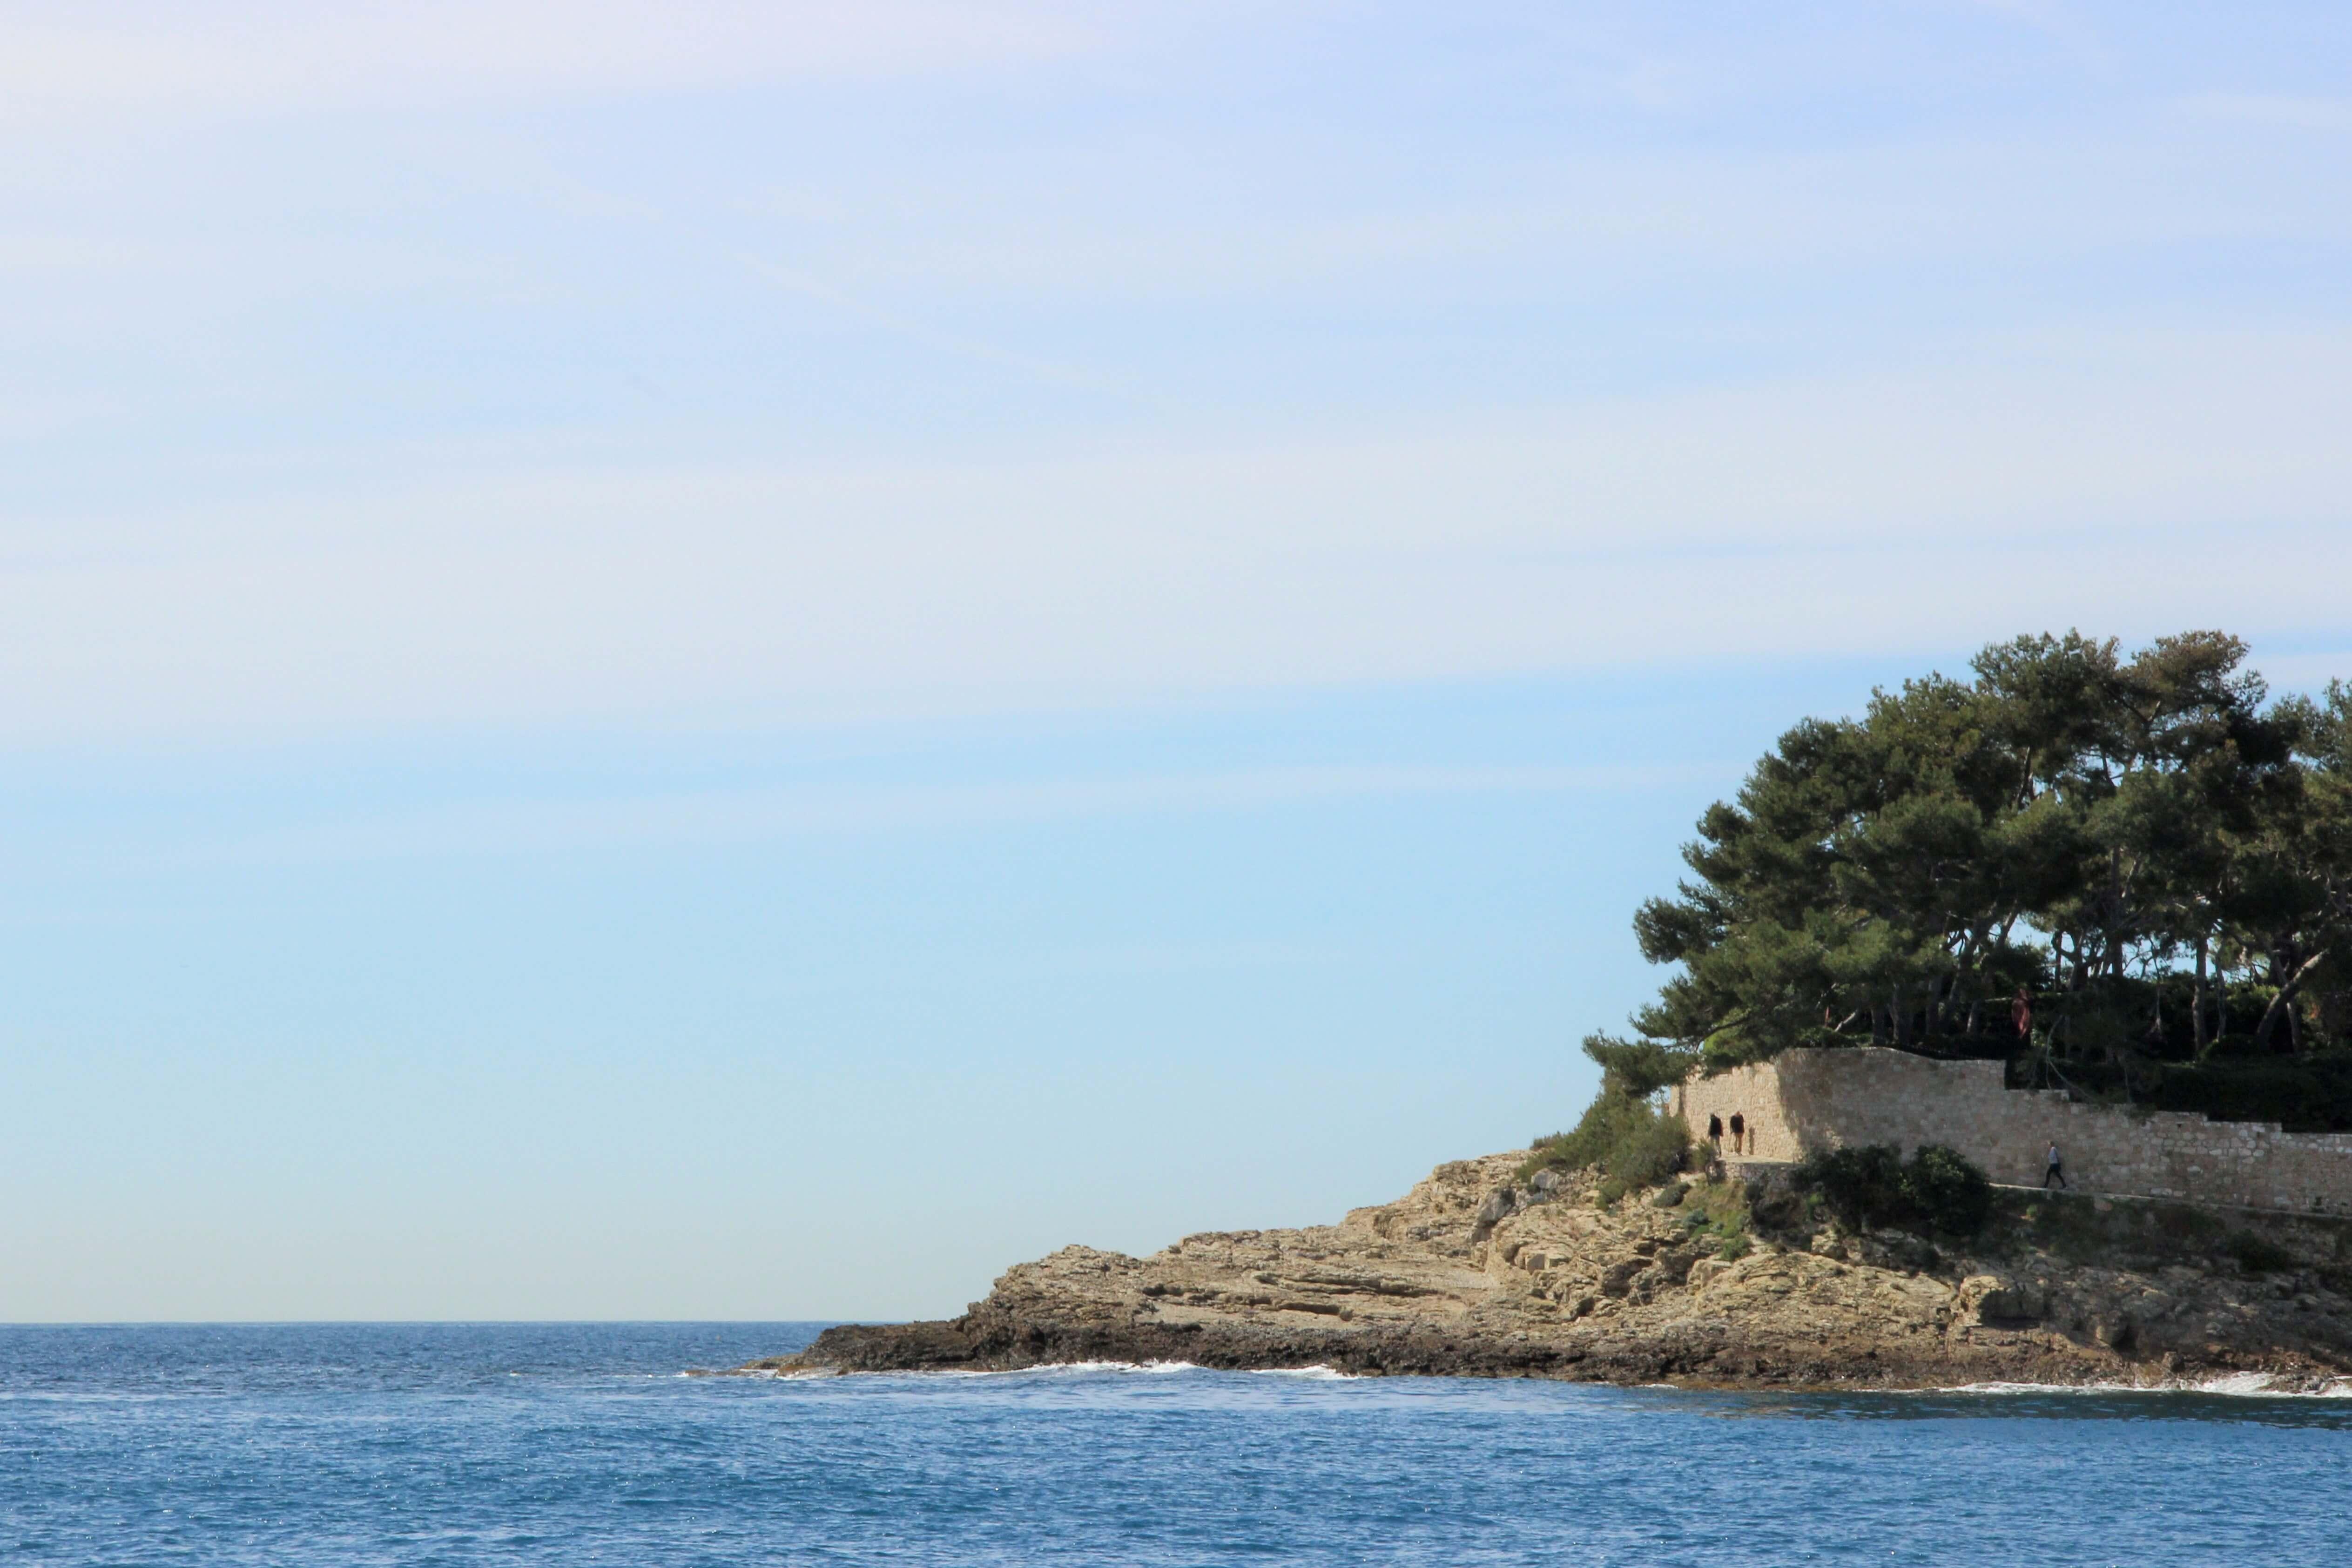 Pointe-Saint-Hospice